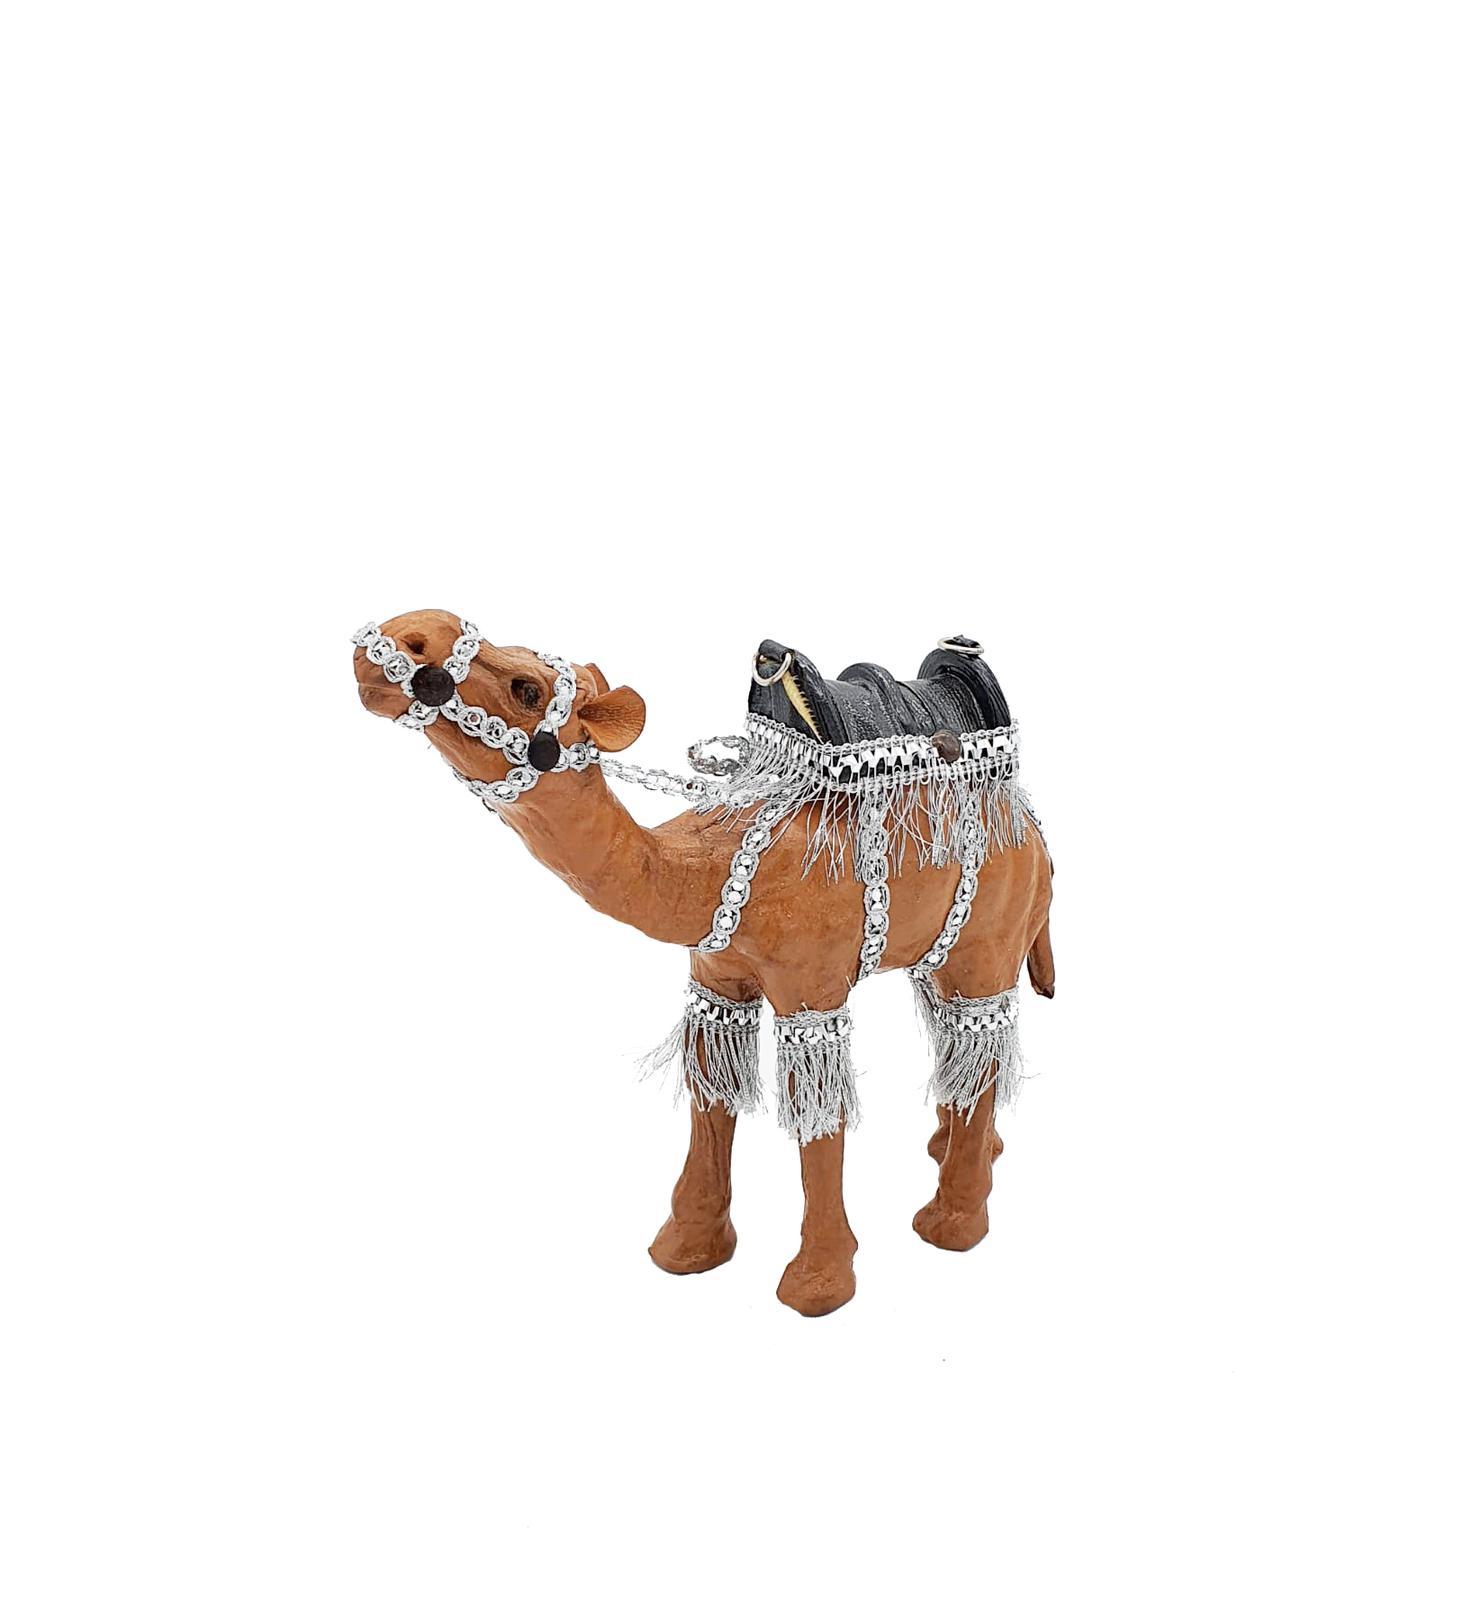 Buy Camel Handmade - 19cm